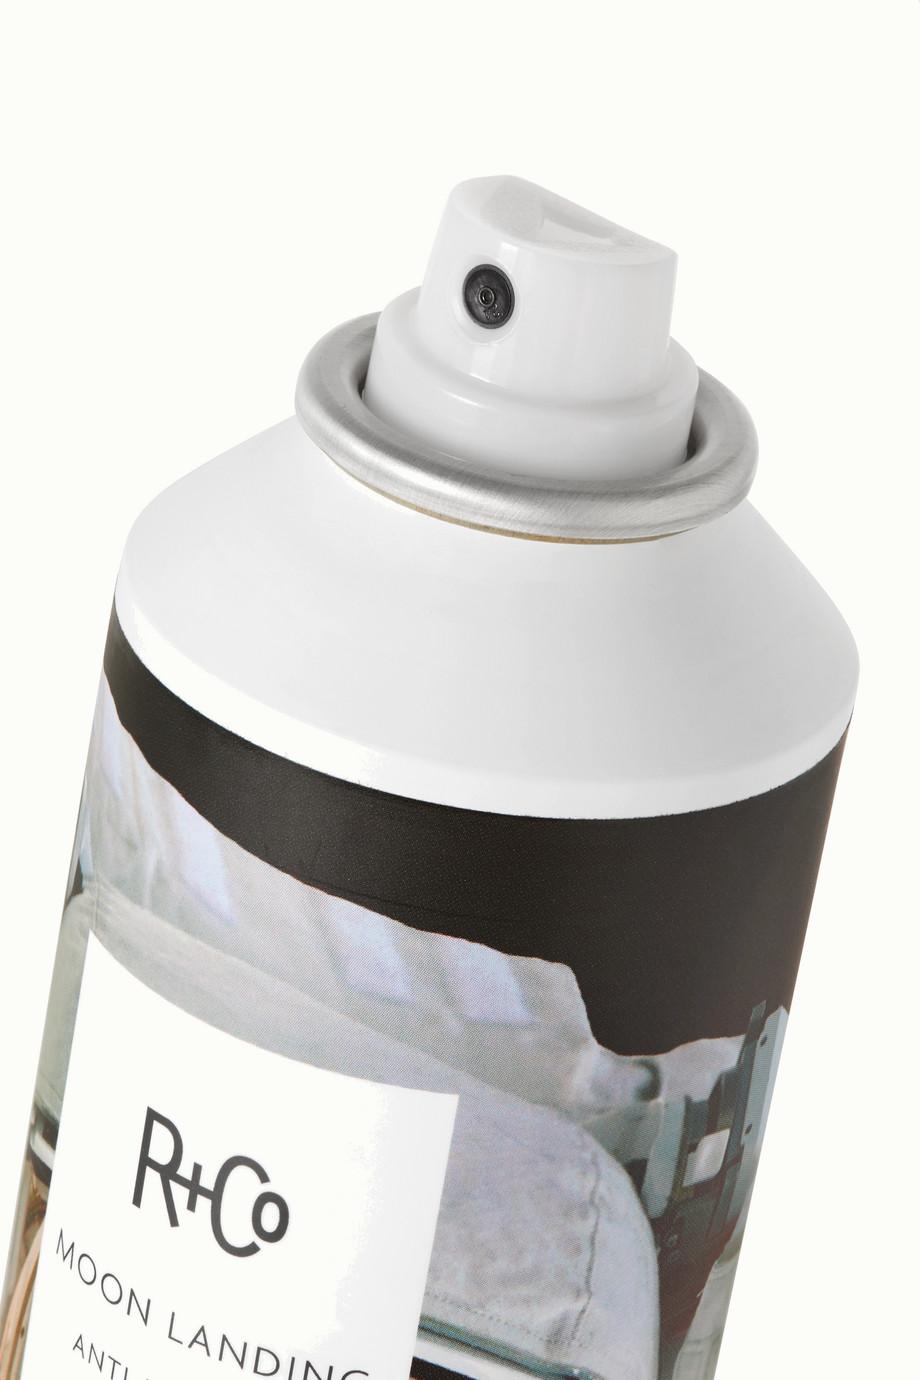 R+Co Moon Landing Anti-Humidity Spray, 180ml